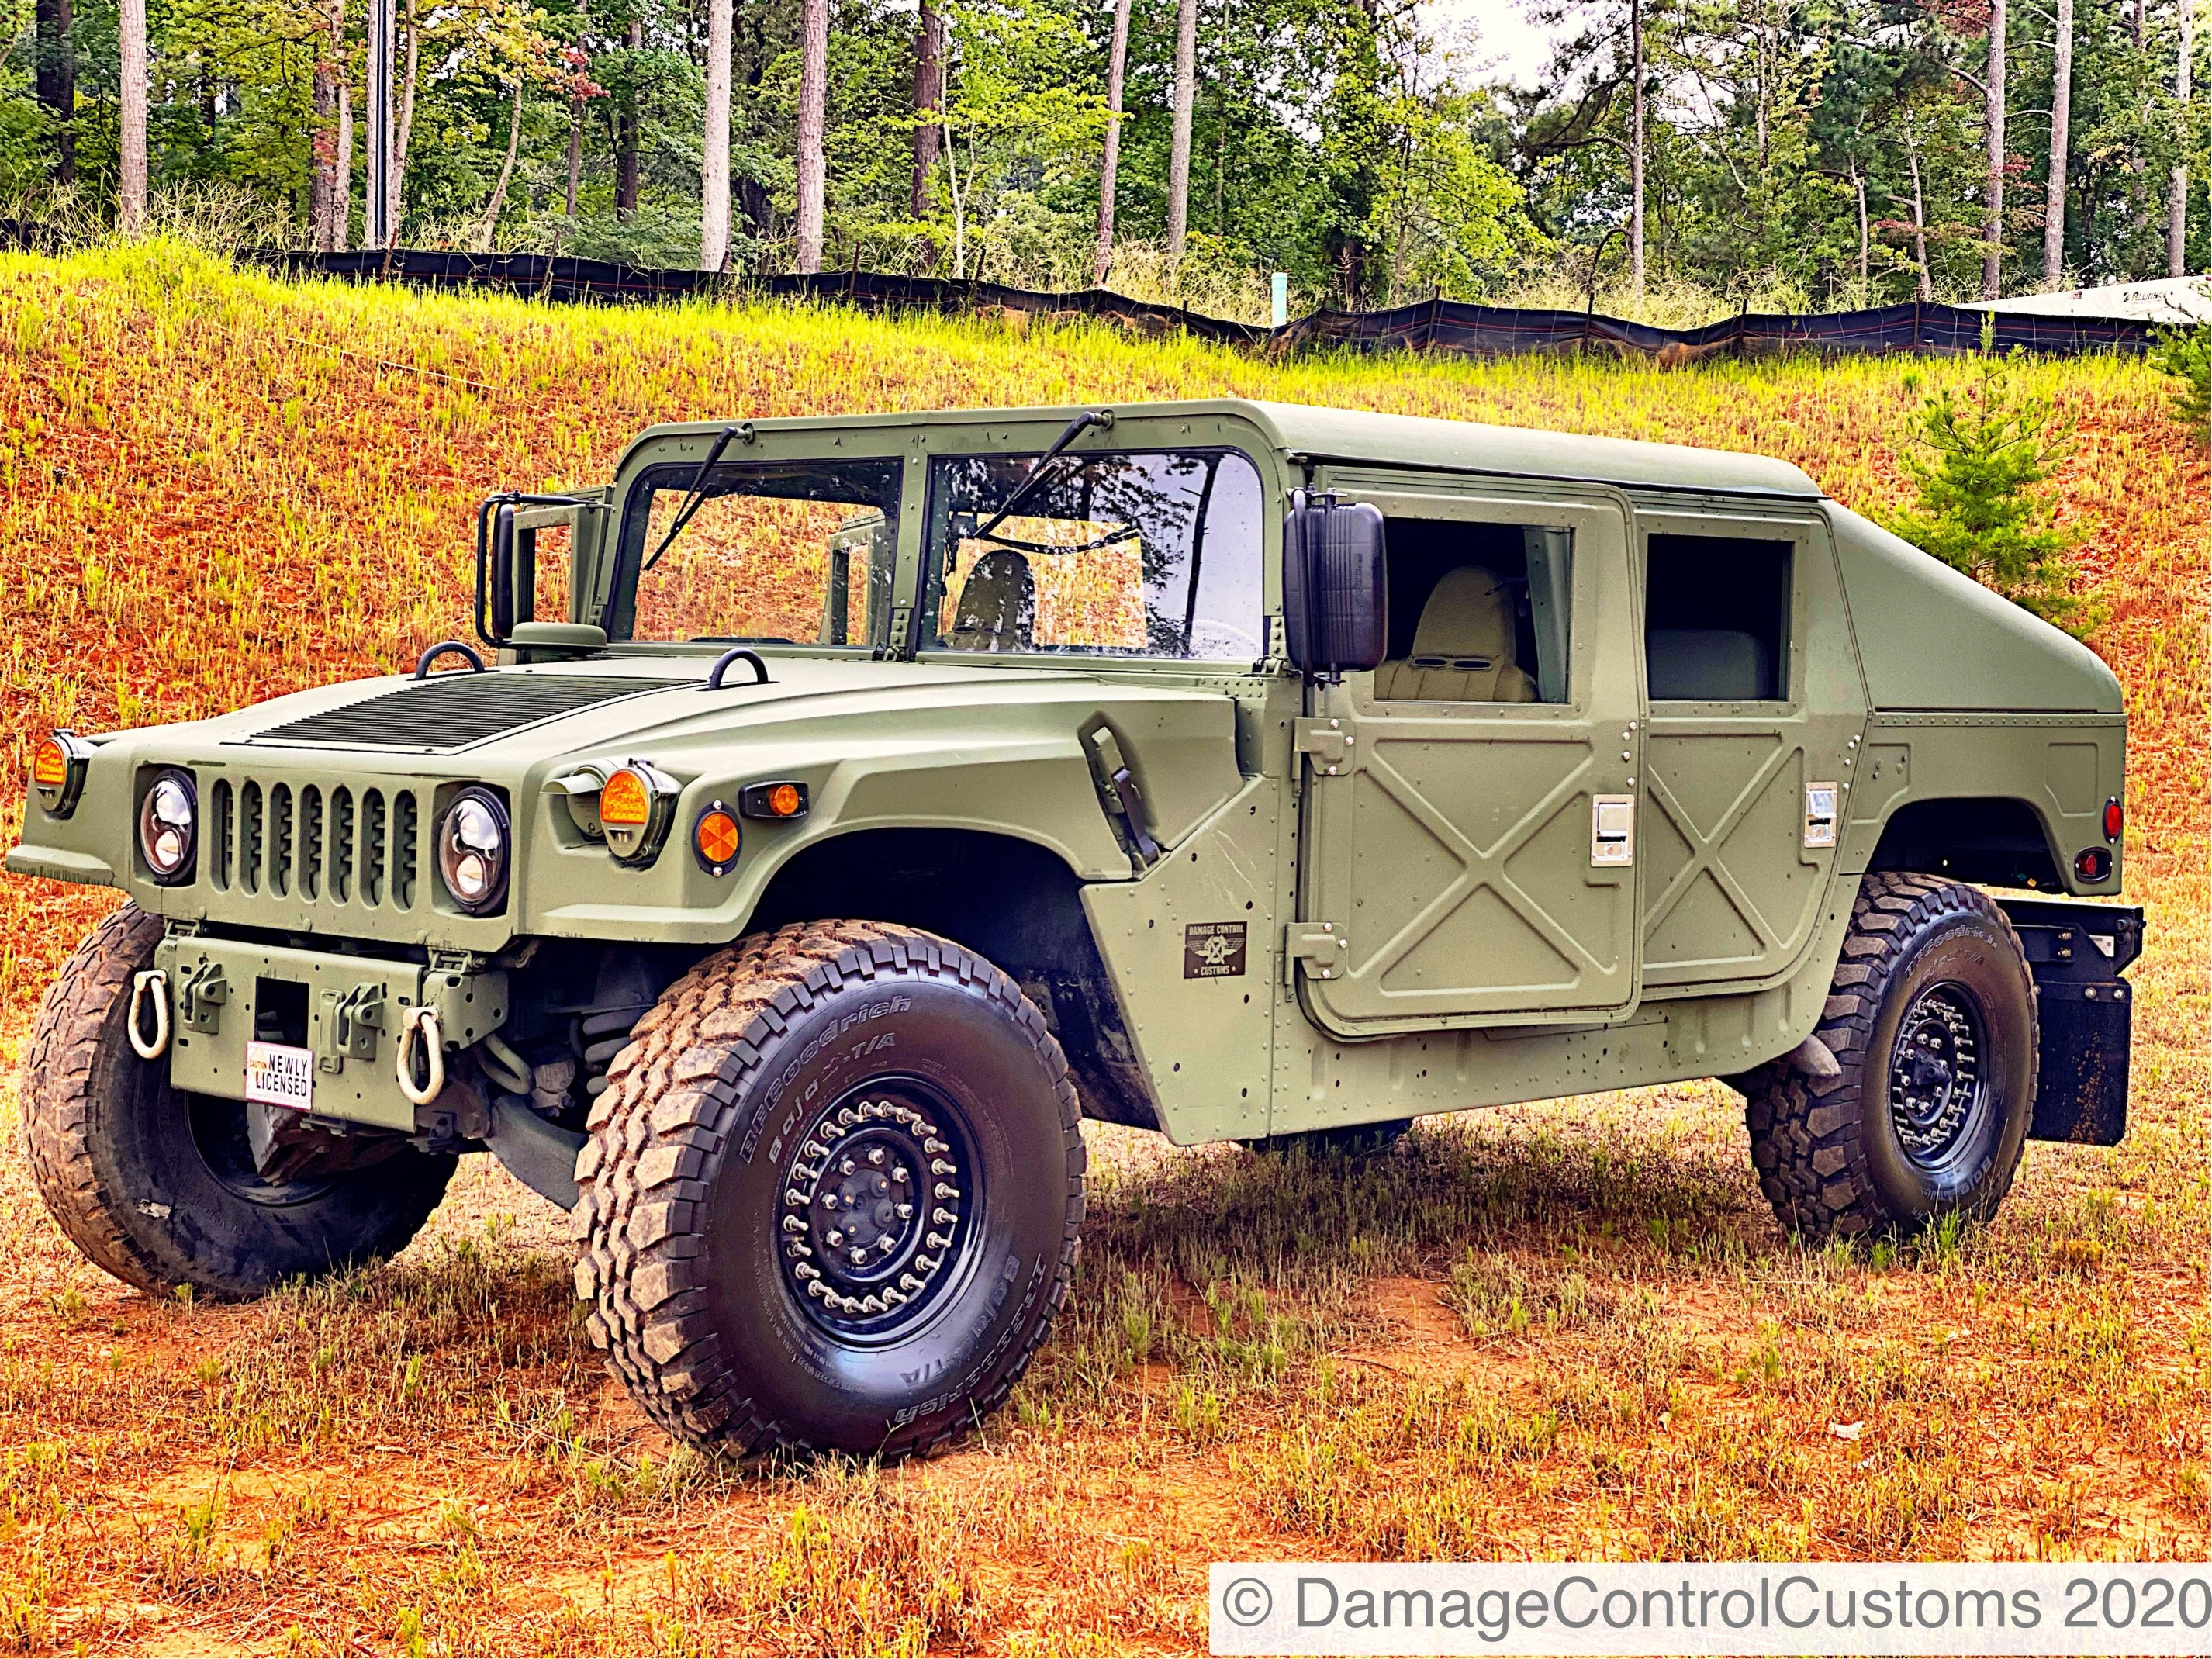 M1045 HMMWV HUMVEE For Sale